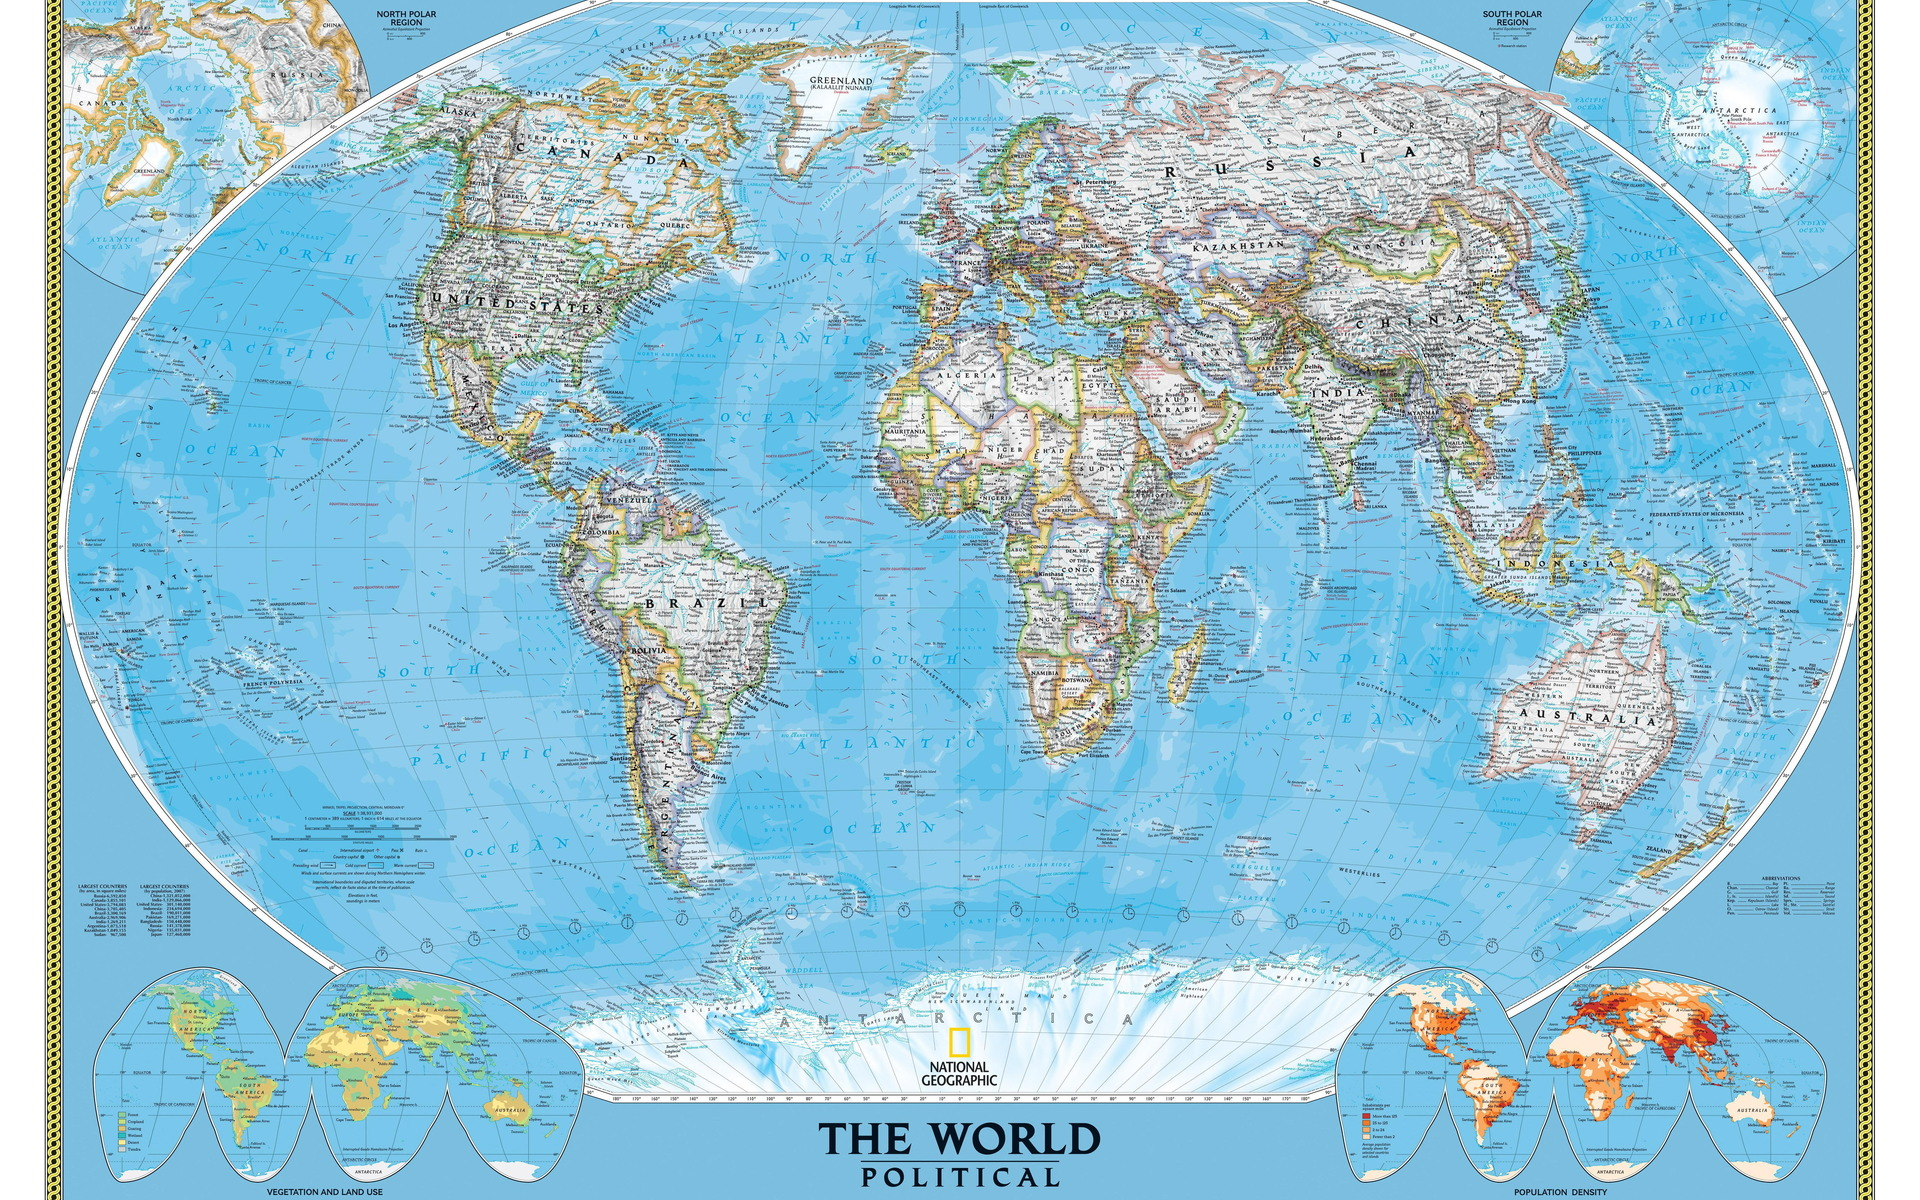 World map desktop wallpaper hd wallpapersafari map world wallpaper national geographic hd desktop wallpapers 1920x1200 gumiabroncs Gallery